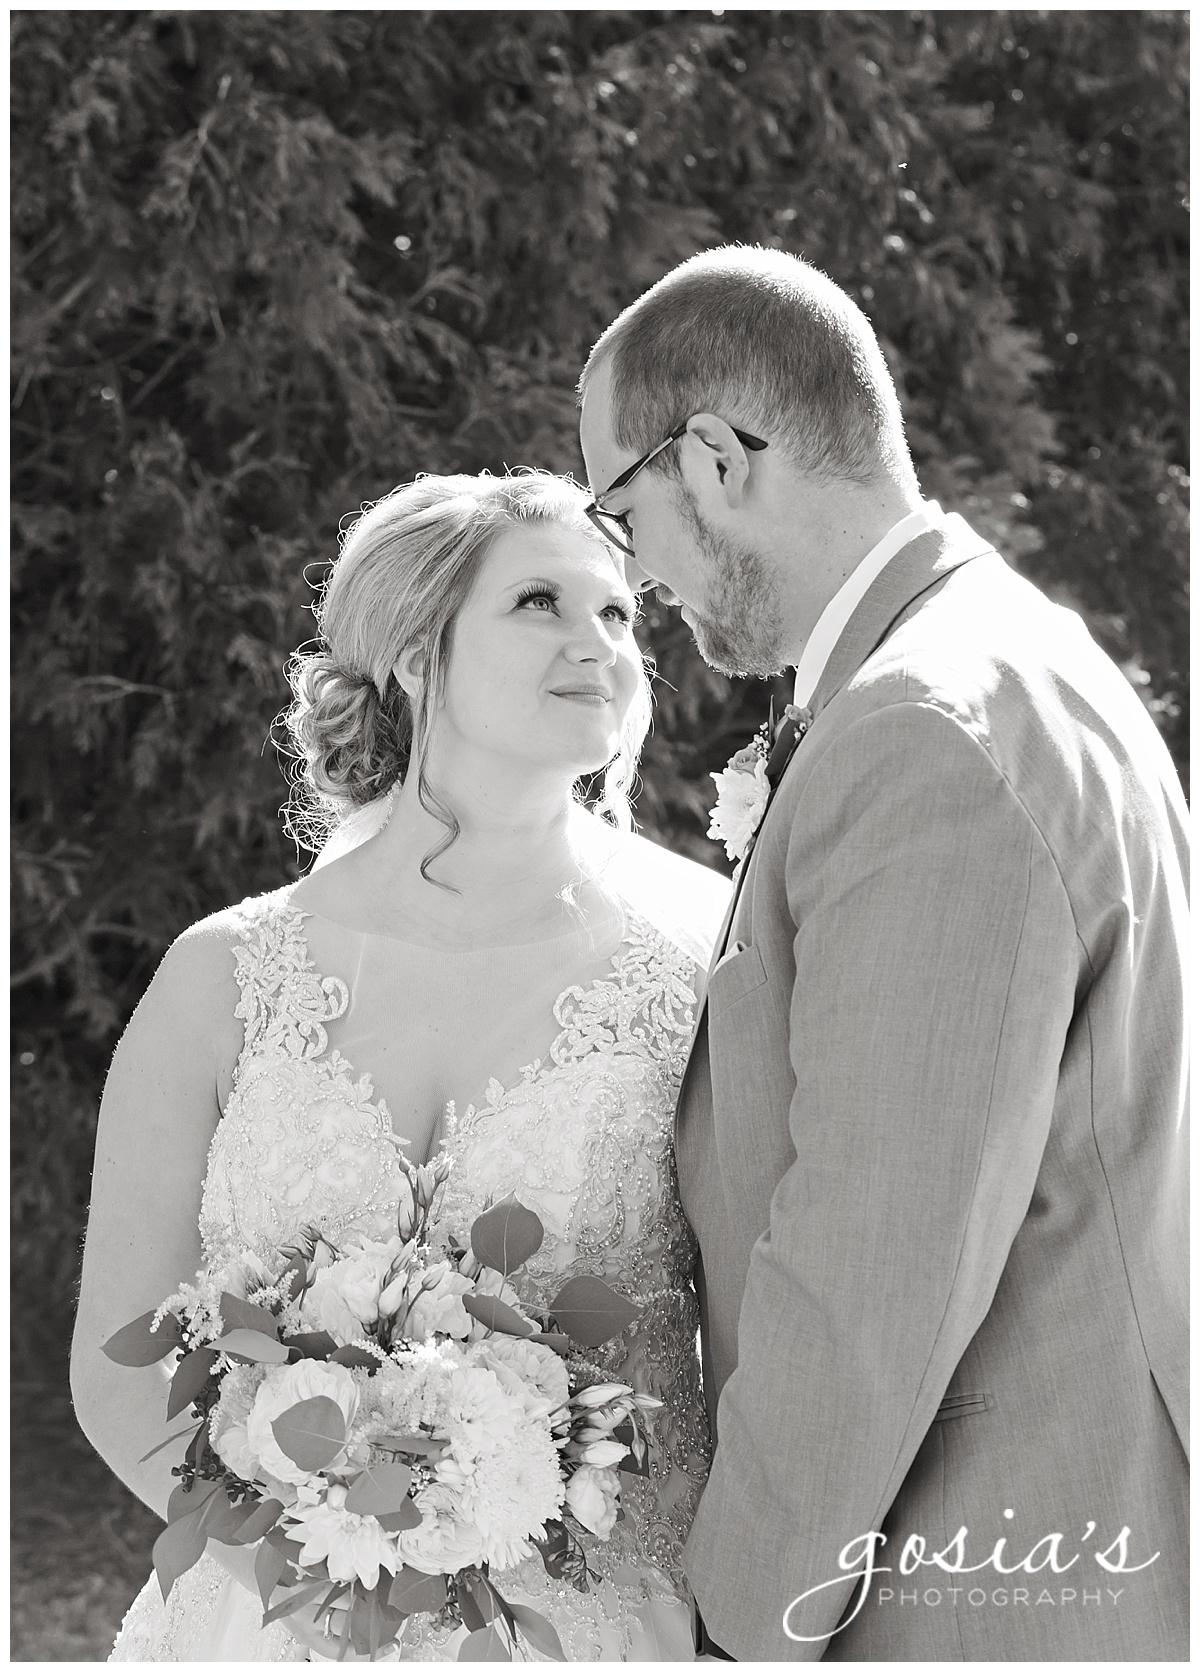 Gosias-Photography-Appleton-wedding-photographer-Fond-du-Lac-ceremony-Holiday-Inn-reception-Shelby-Ryan-_0027.jpg